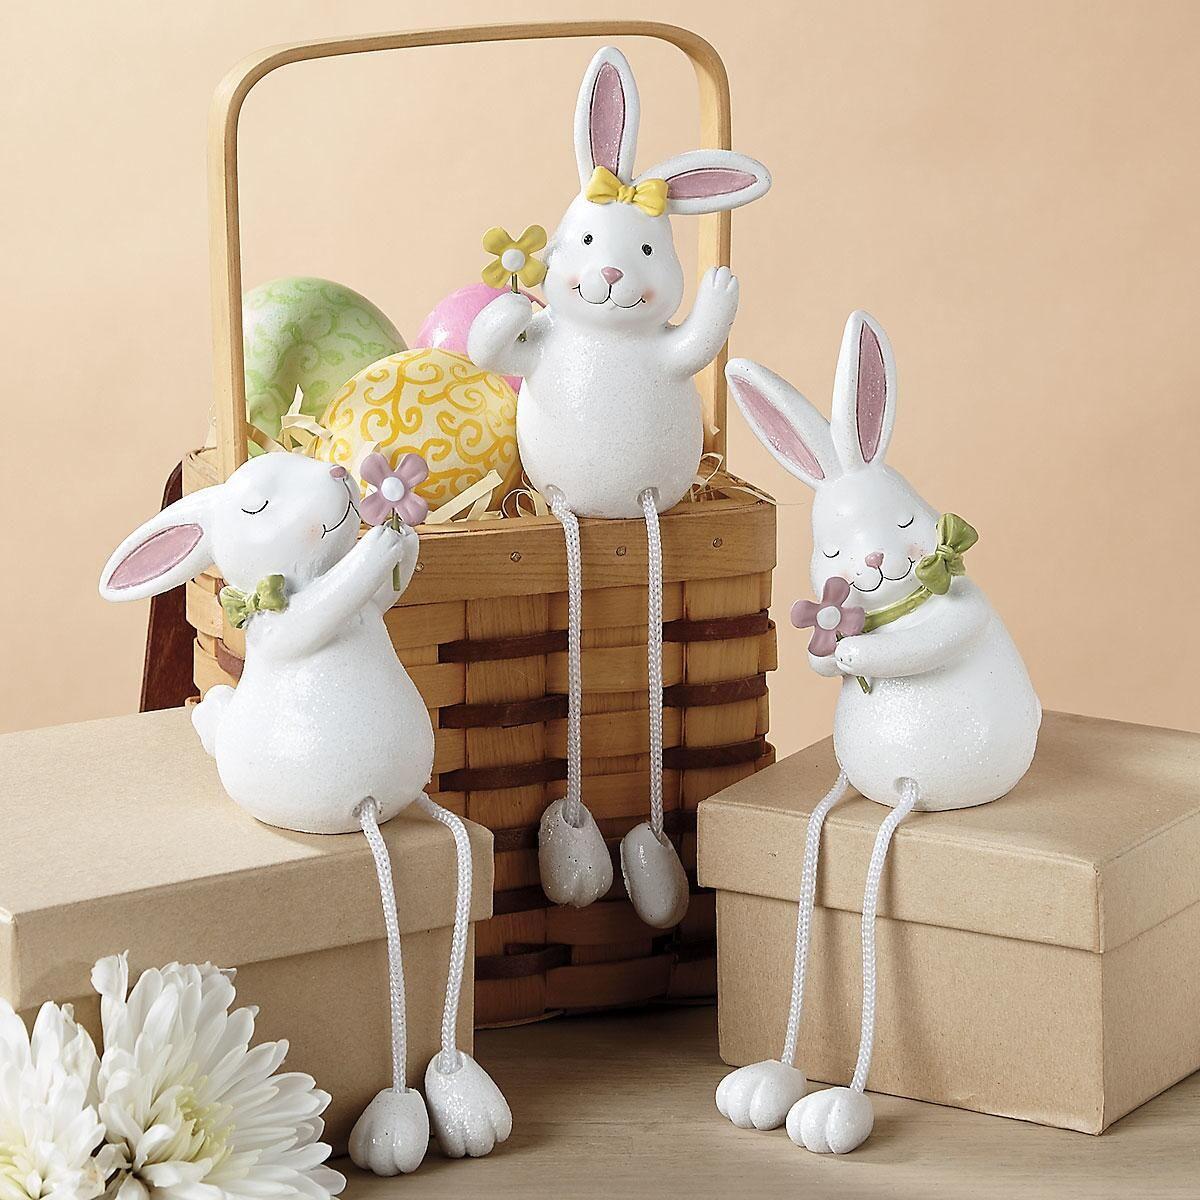 Bunny Figurines